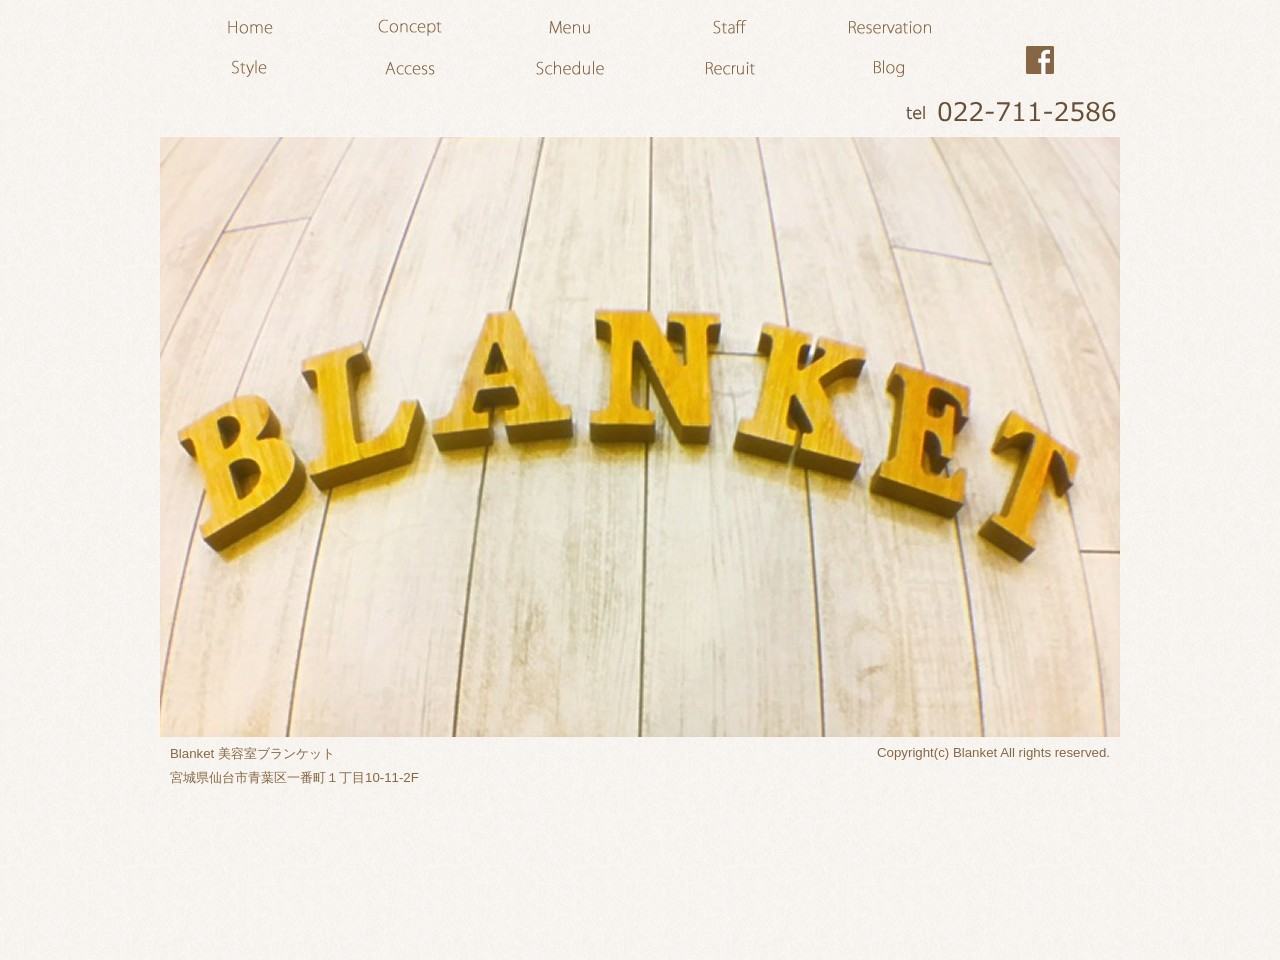 Hair Design Blanket (ヘアー デザイン ブランケット)